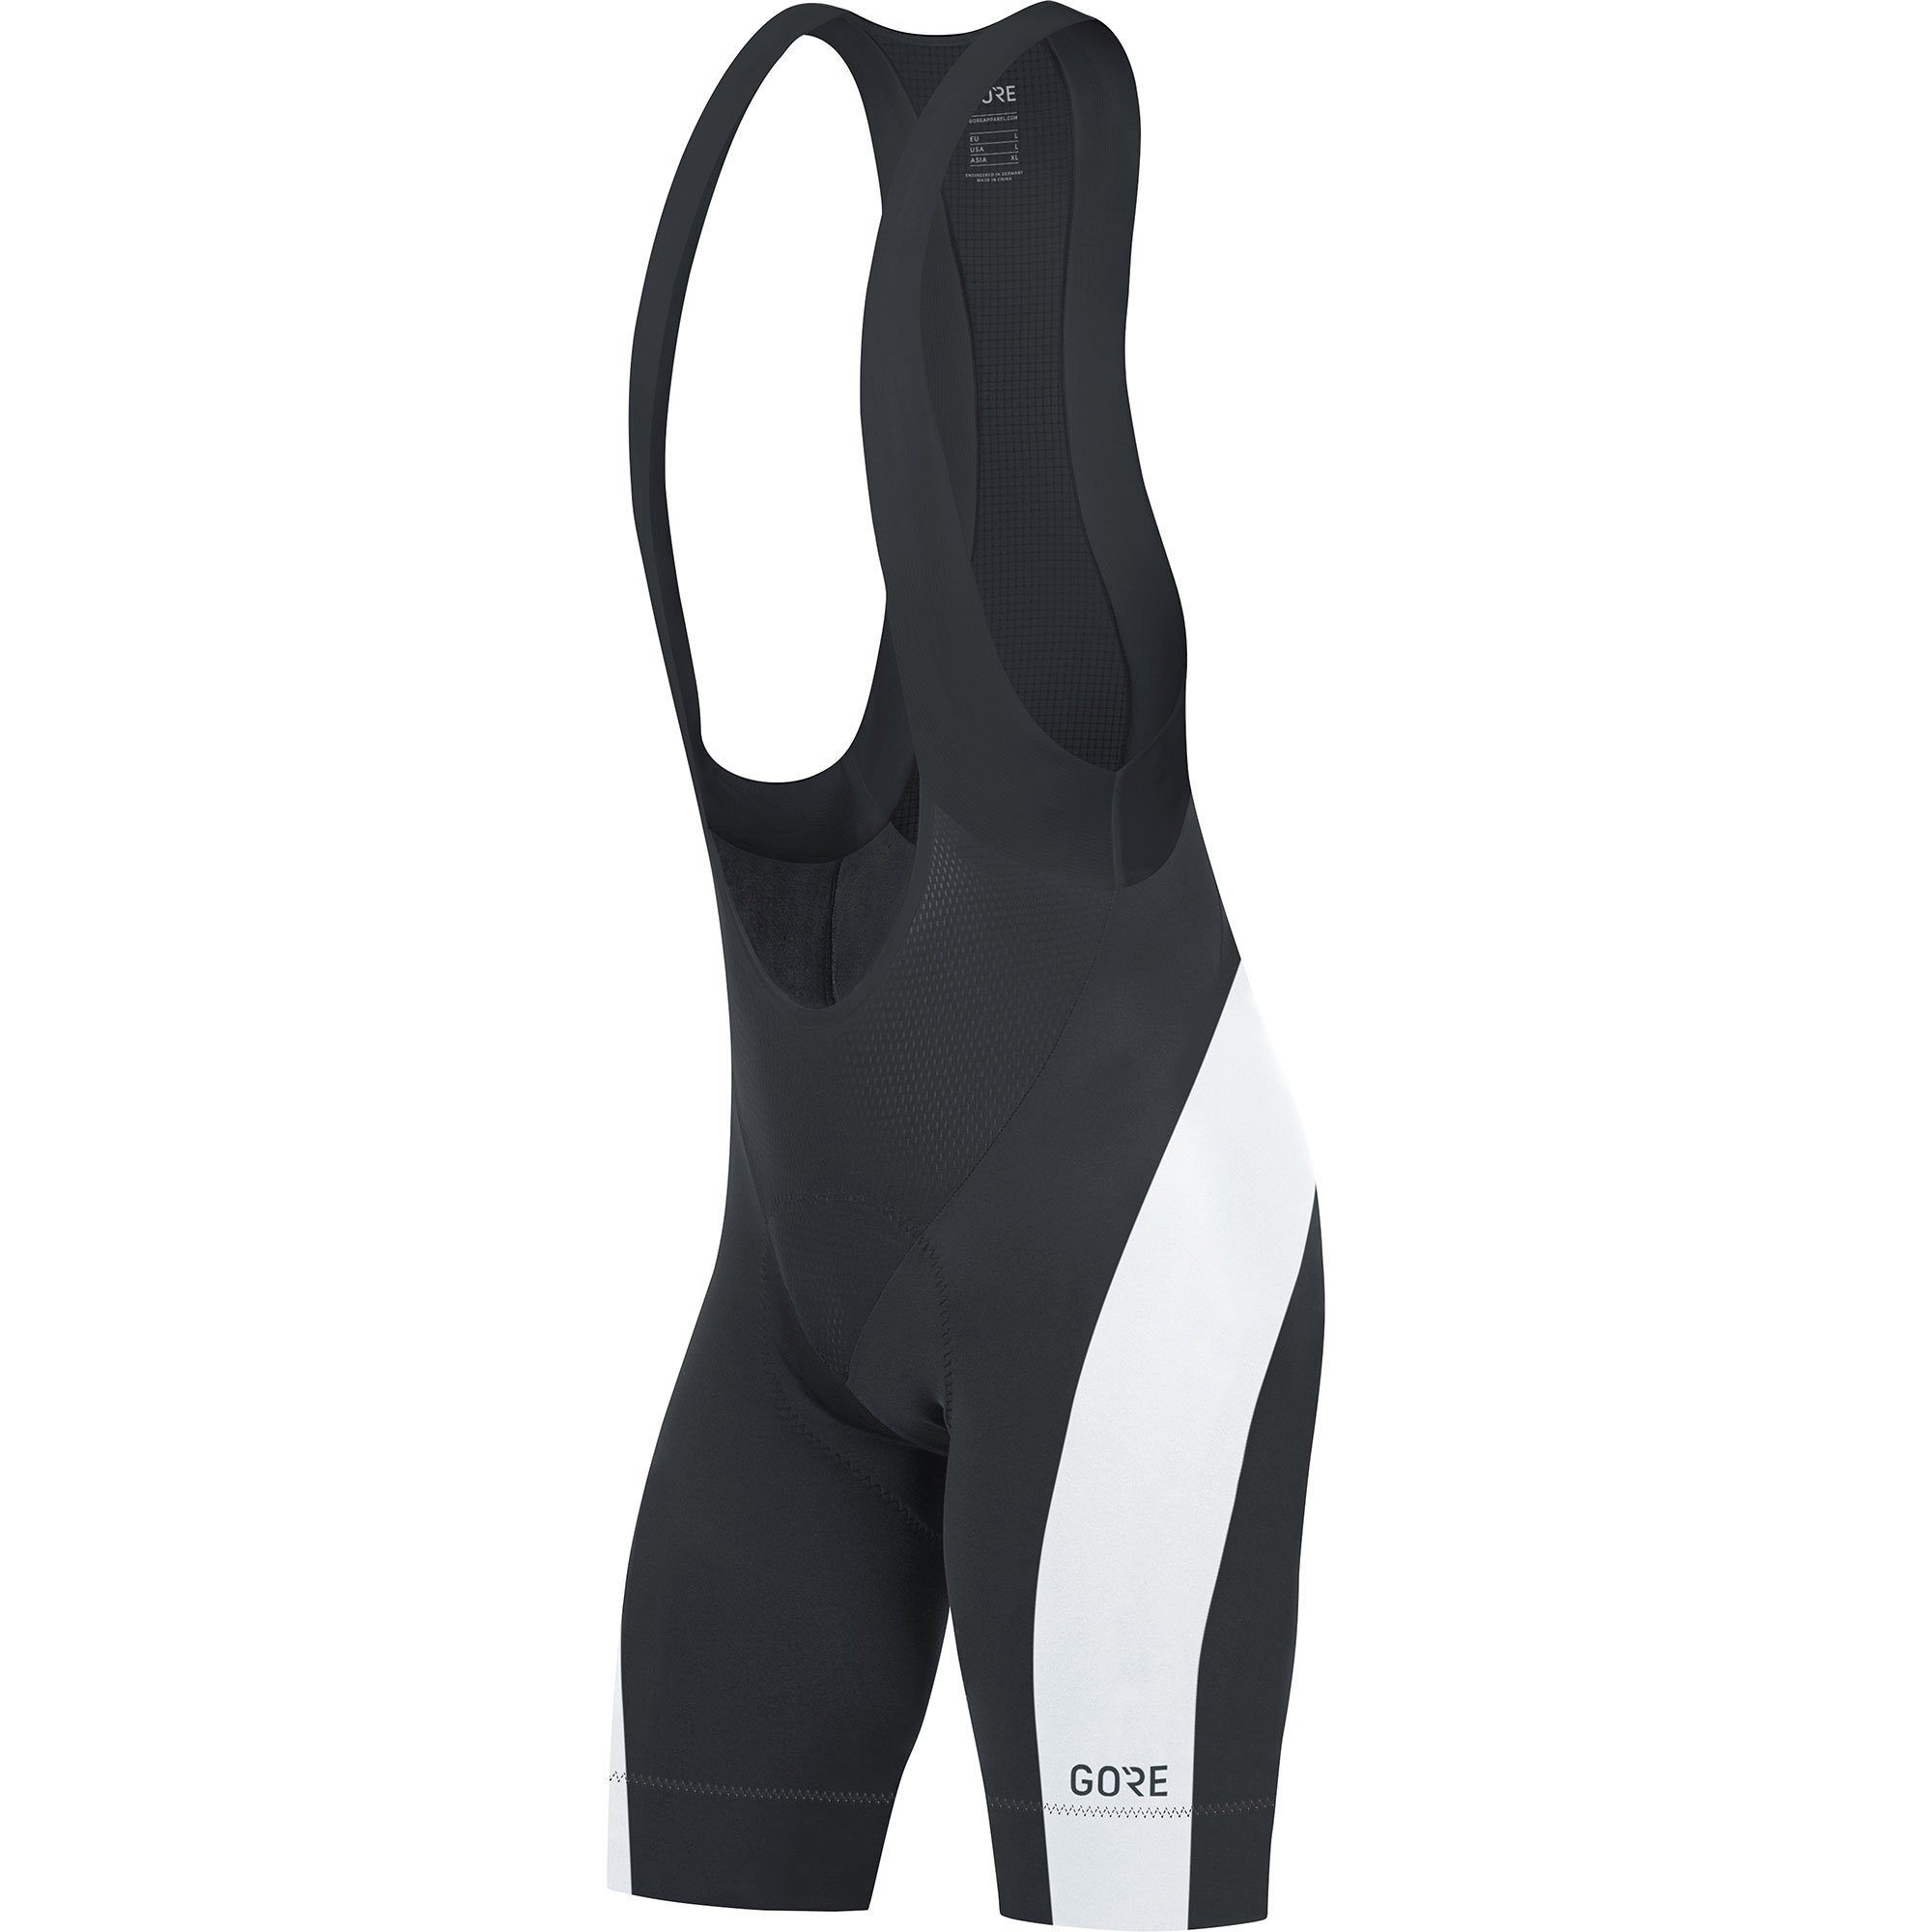 GORE Wear Men's Breathable Road Bike Bib Shorts, With Seat Insert, GORE Wear C5 Bib Shorts +, Size: XL, Color: Black/White, 100192